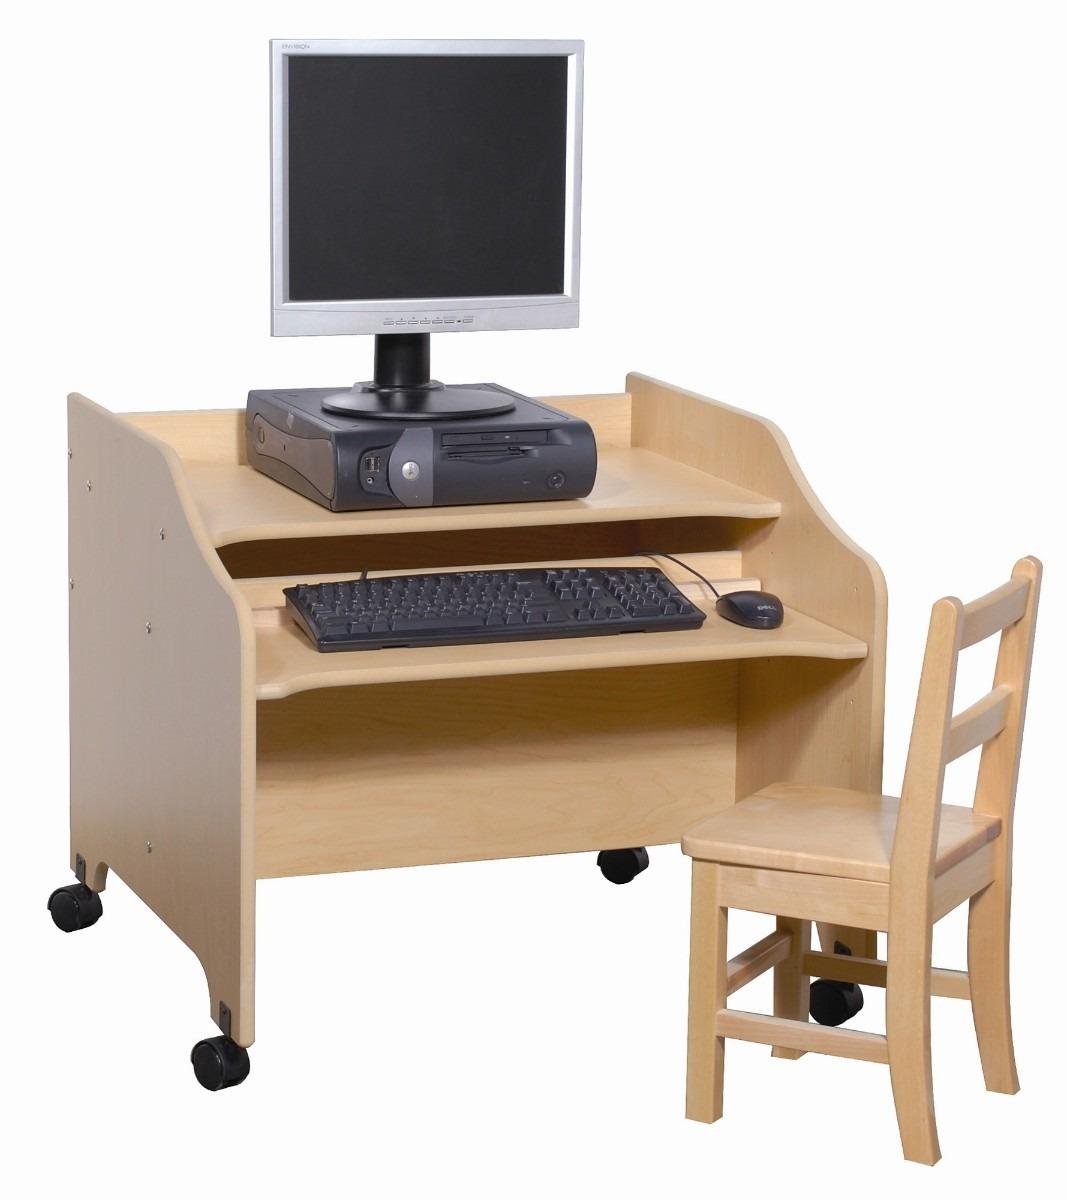 Escritorio para su computadora steffy deluxe vv4 4 937 for Escritorio para computadora